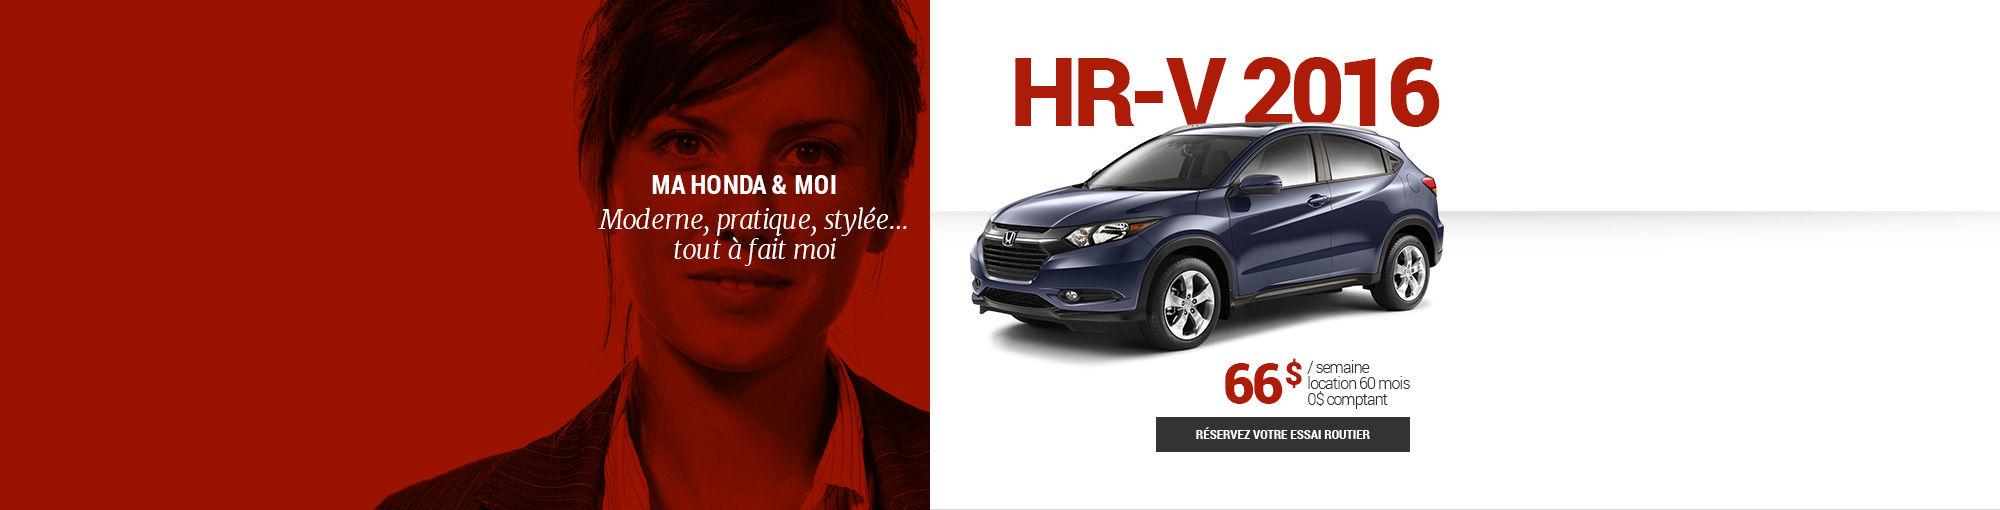 HR-V 2016 - mai-juin-juillet-août-septembre 2016